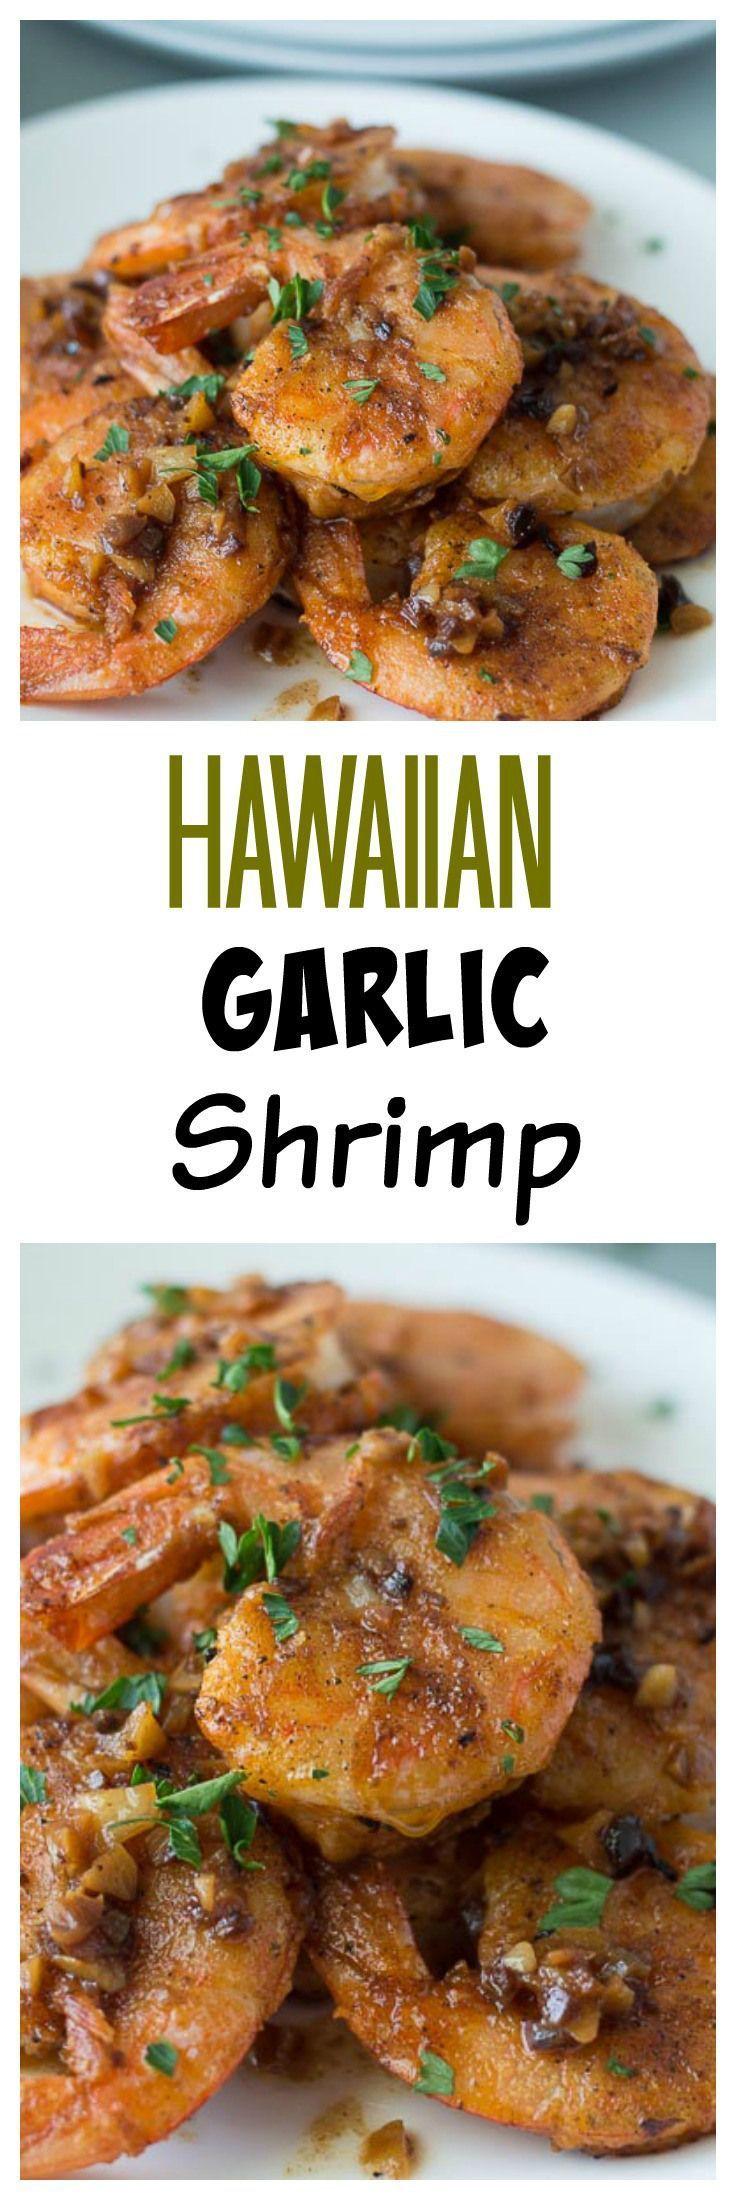 This Hawaiian Garlic Shrimp recipe is paradise!